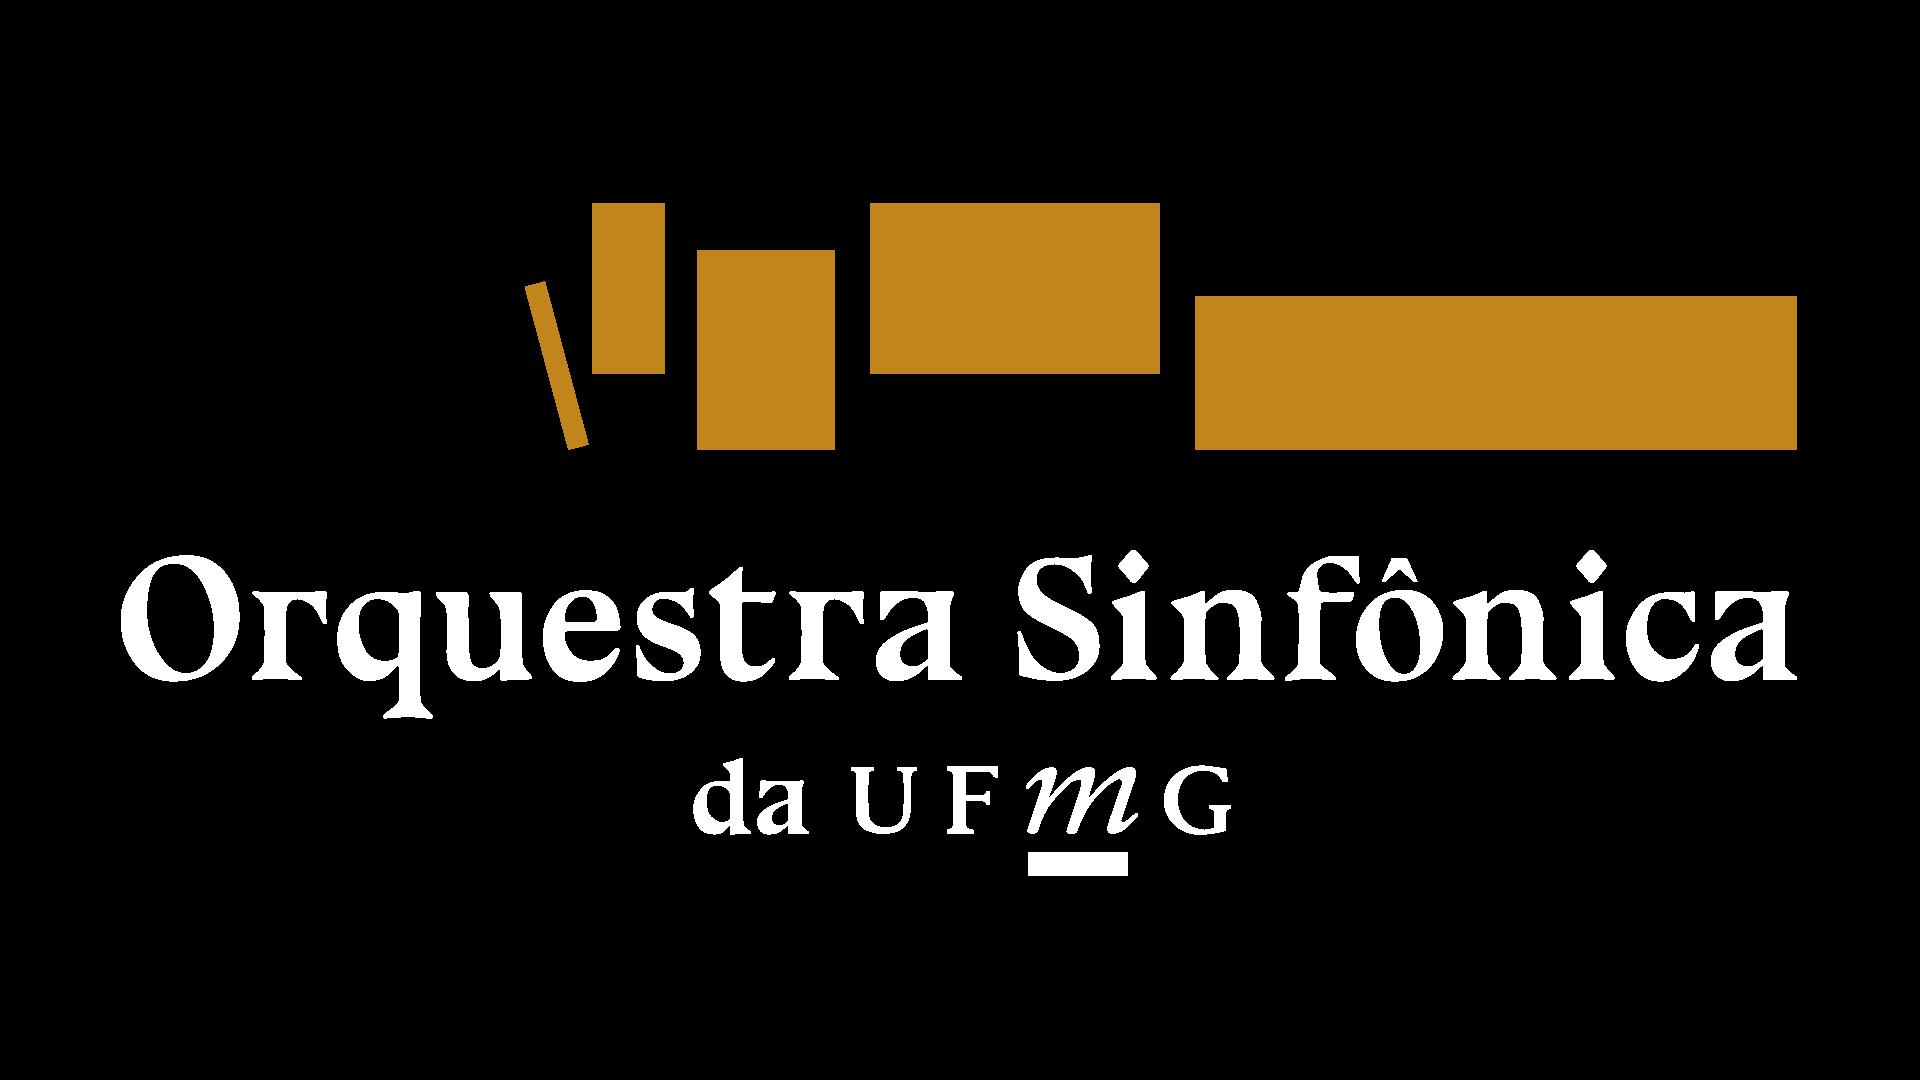 Orquestra Sinfônica da UFMG